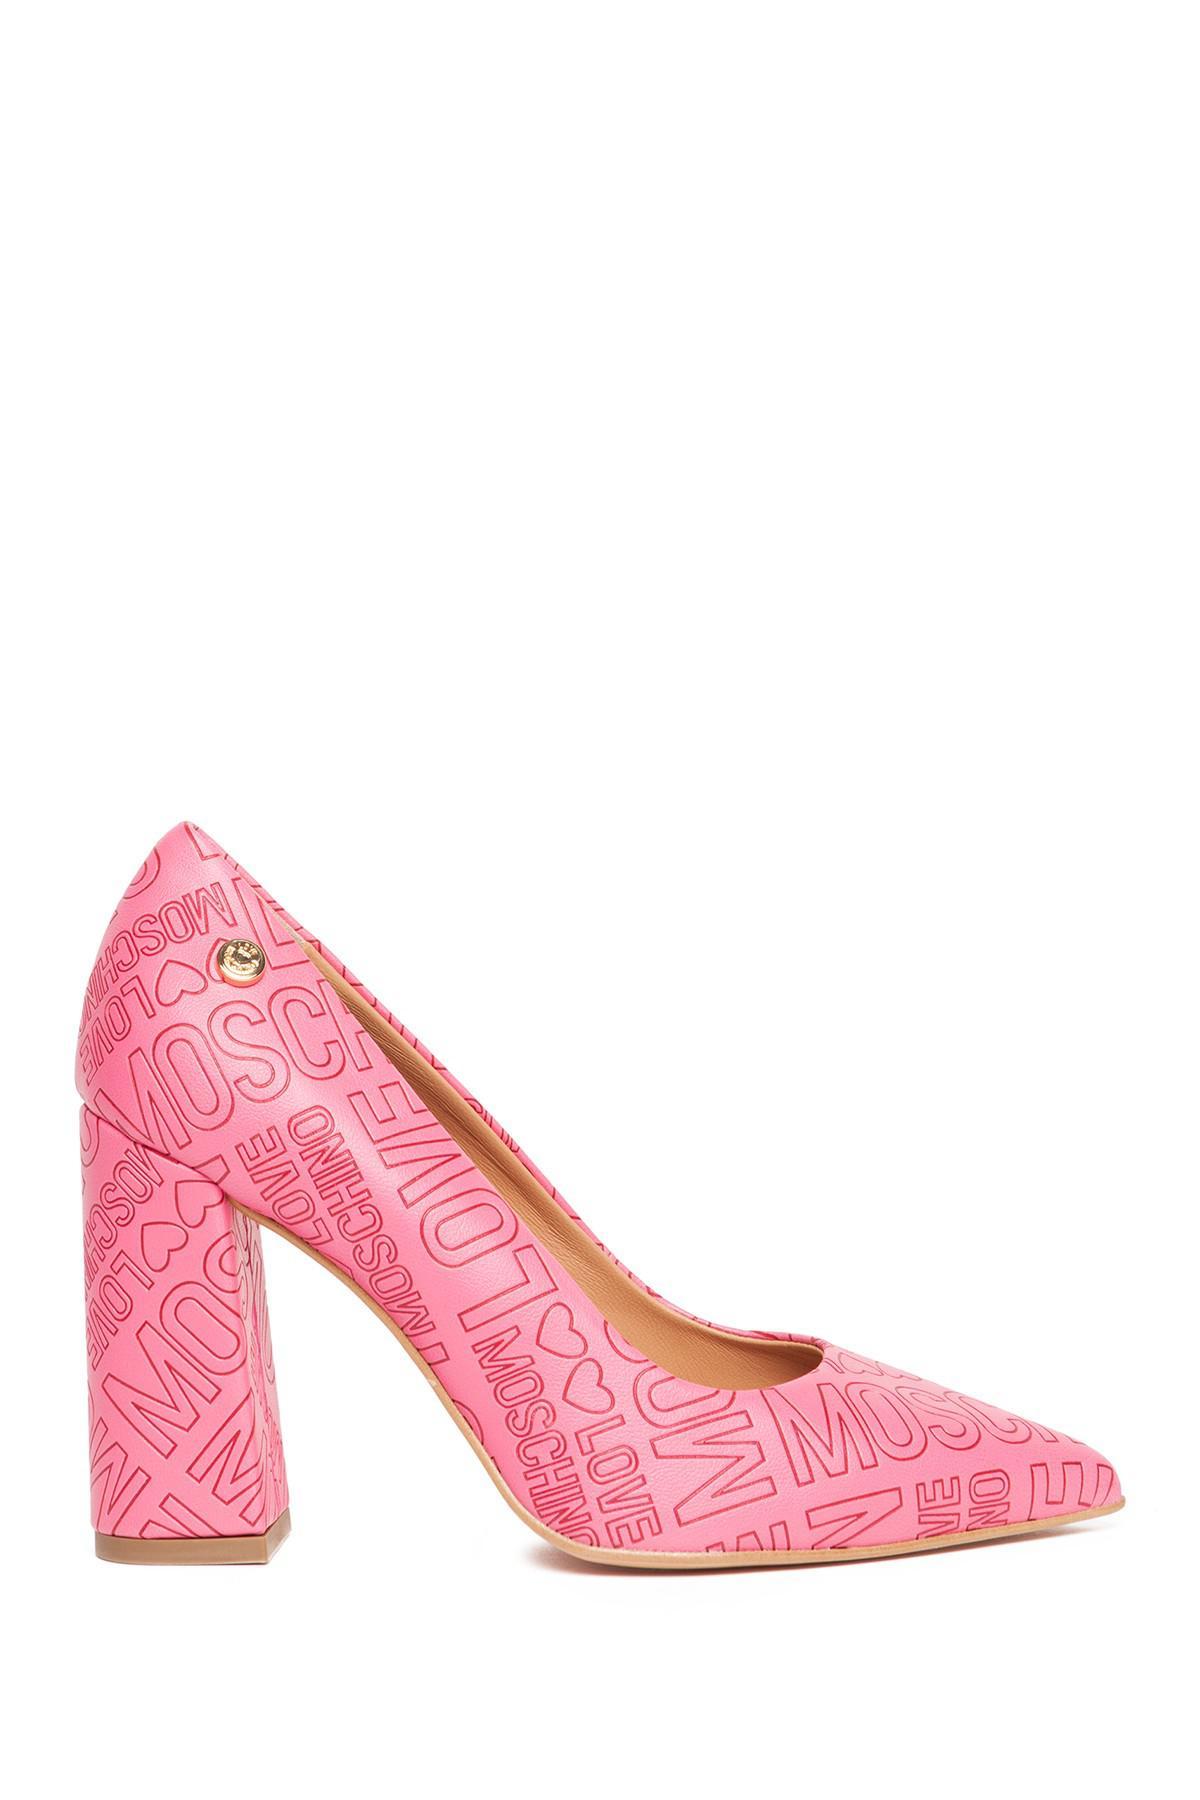 3f7ff47d3203 Lyst - Love Moschino Embossed Block Heel in Pink